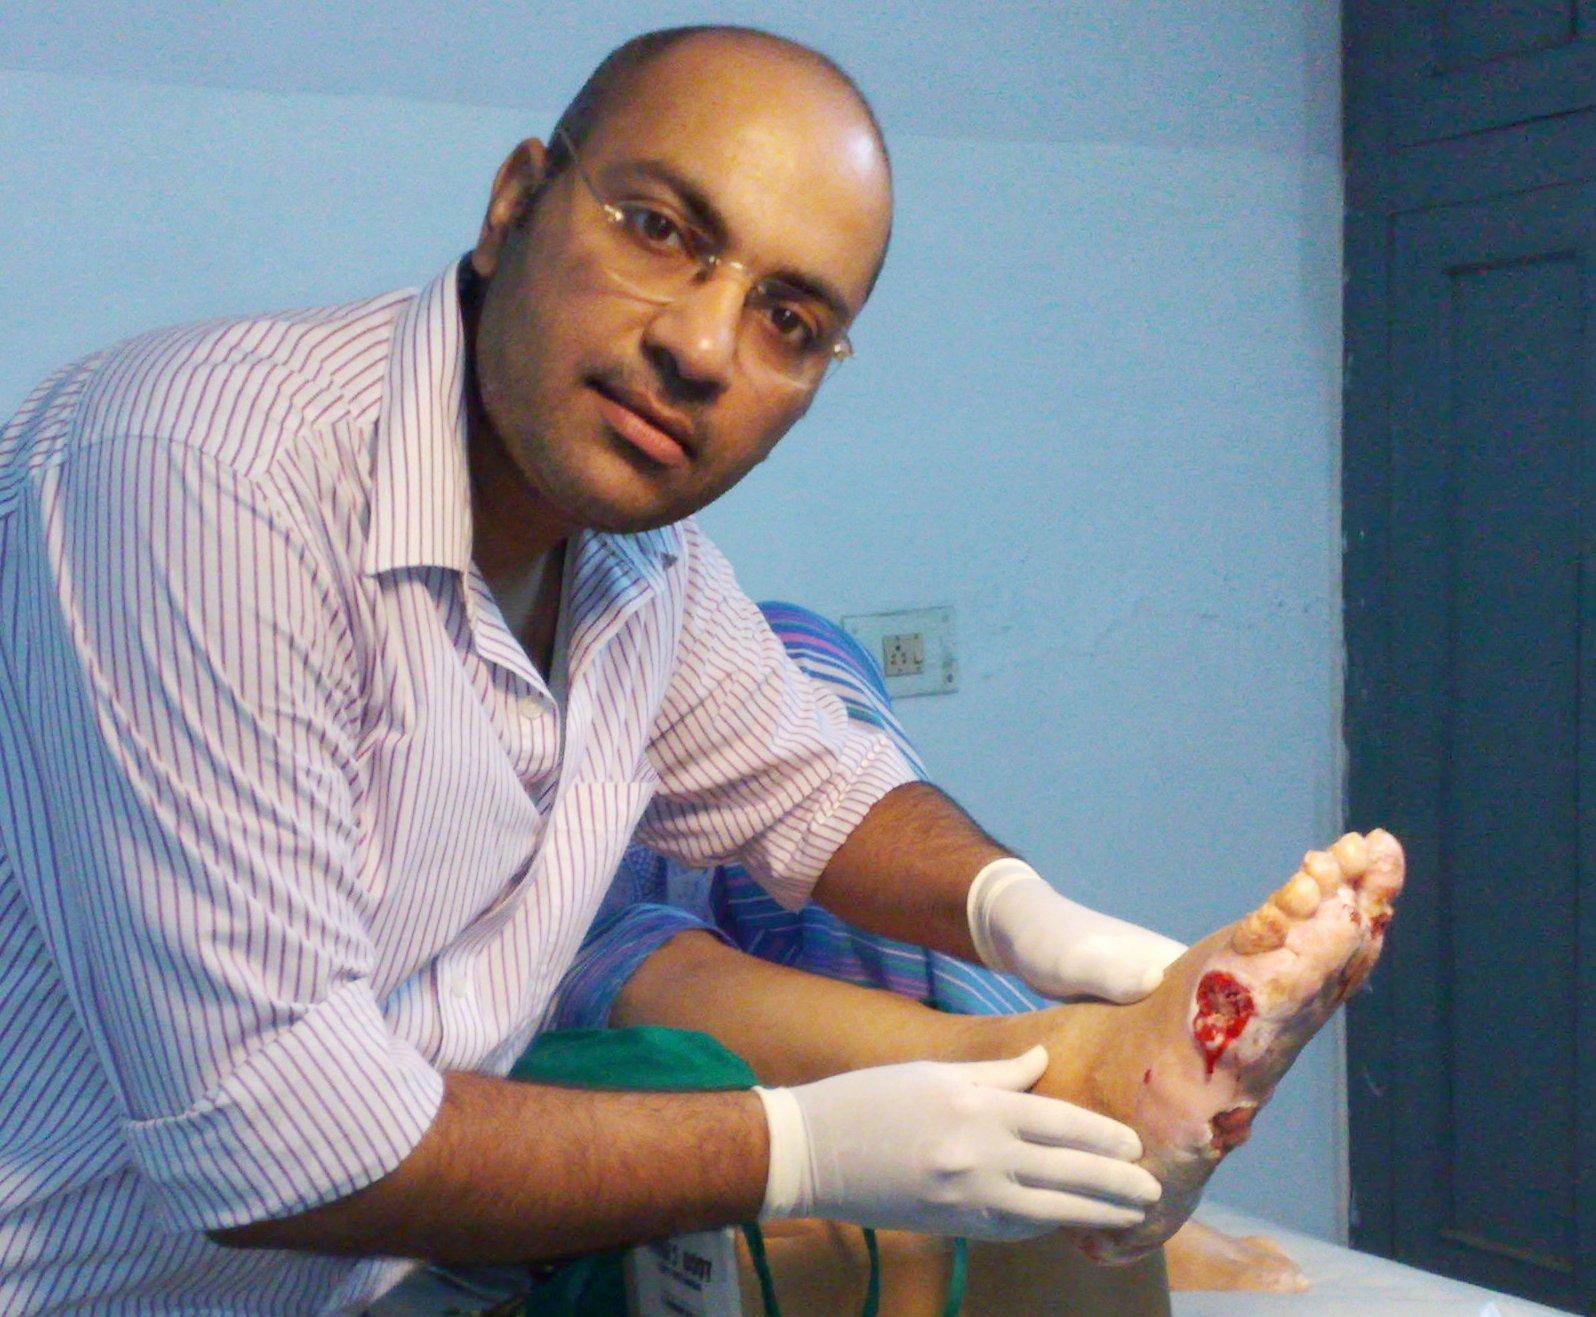 Diabetic foot care regimen 2013